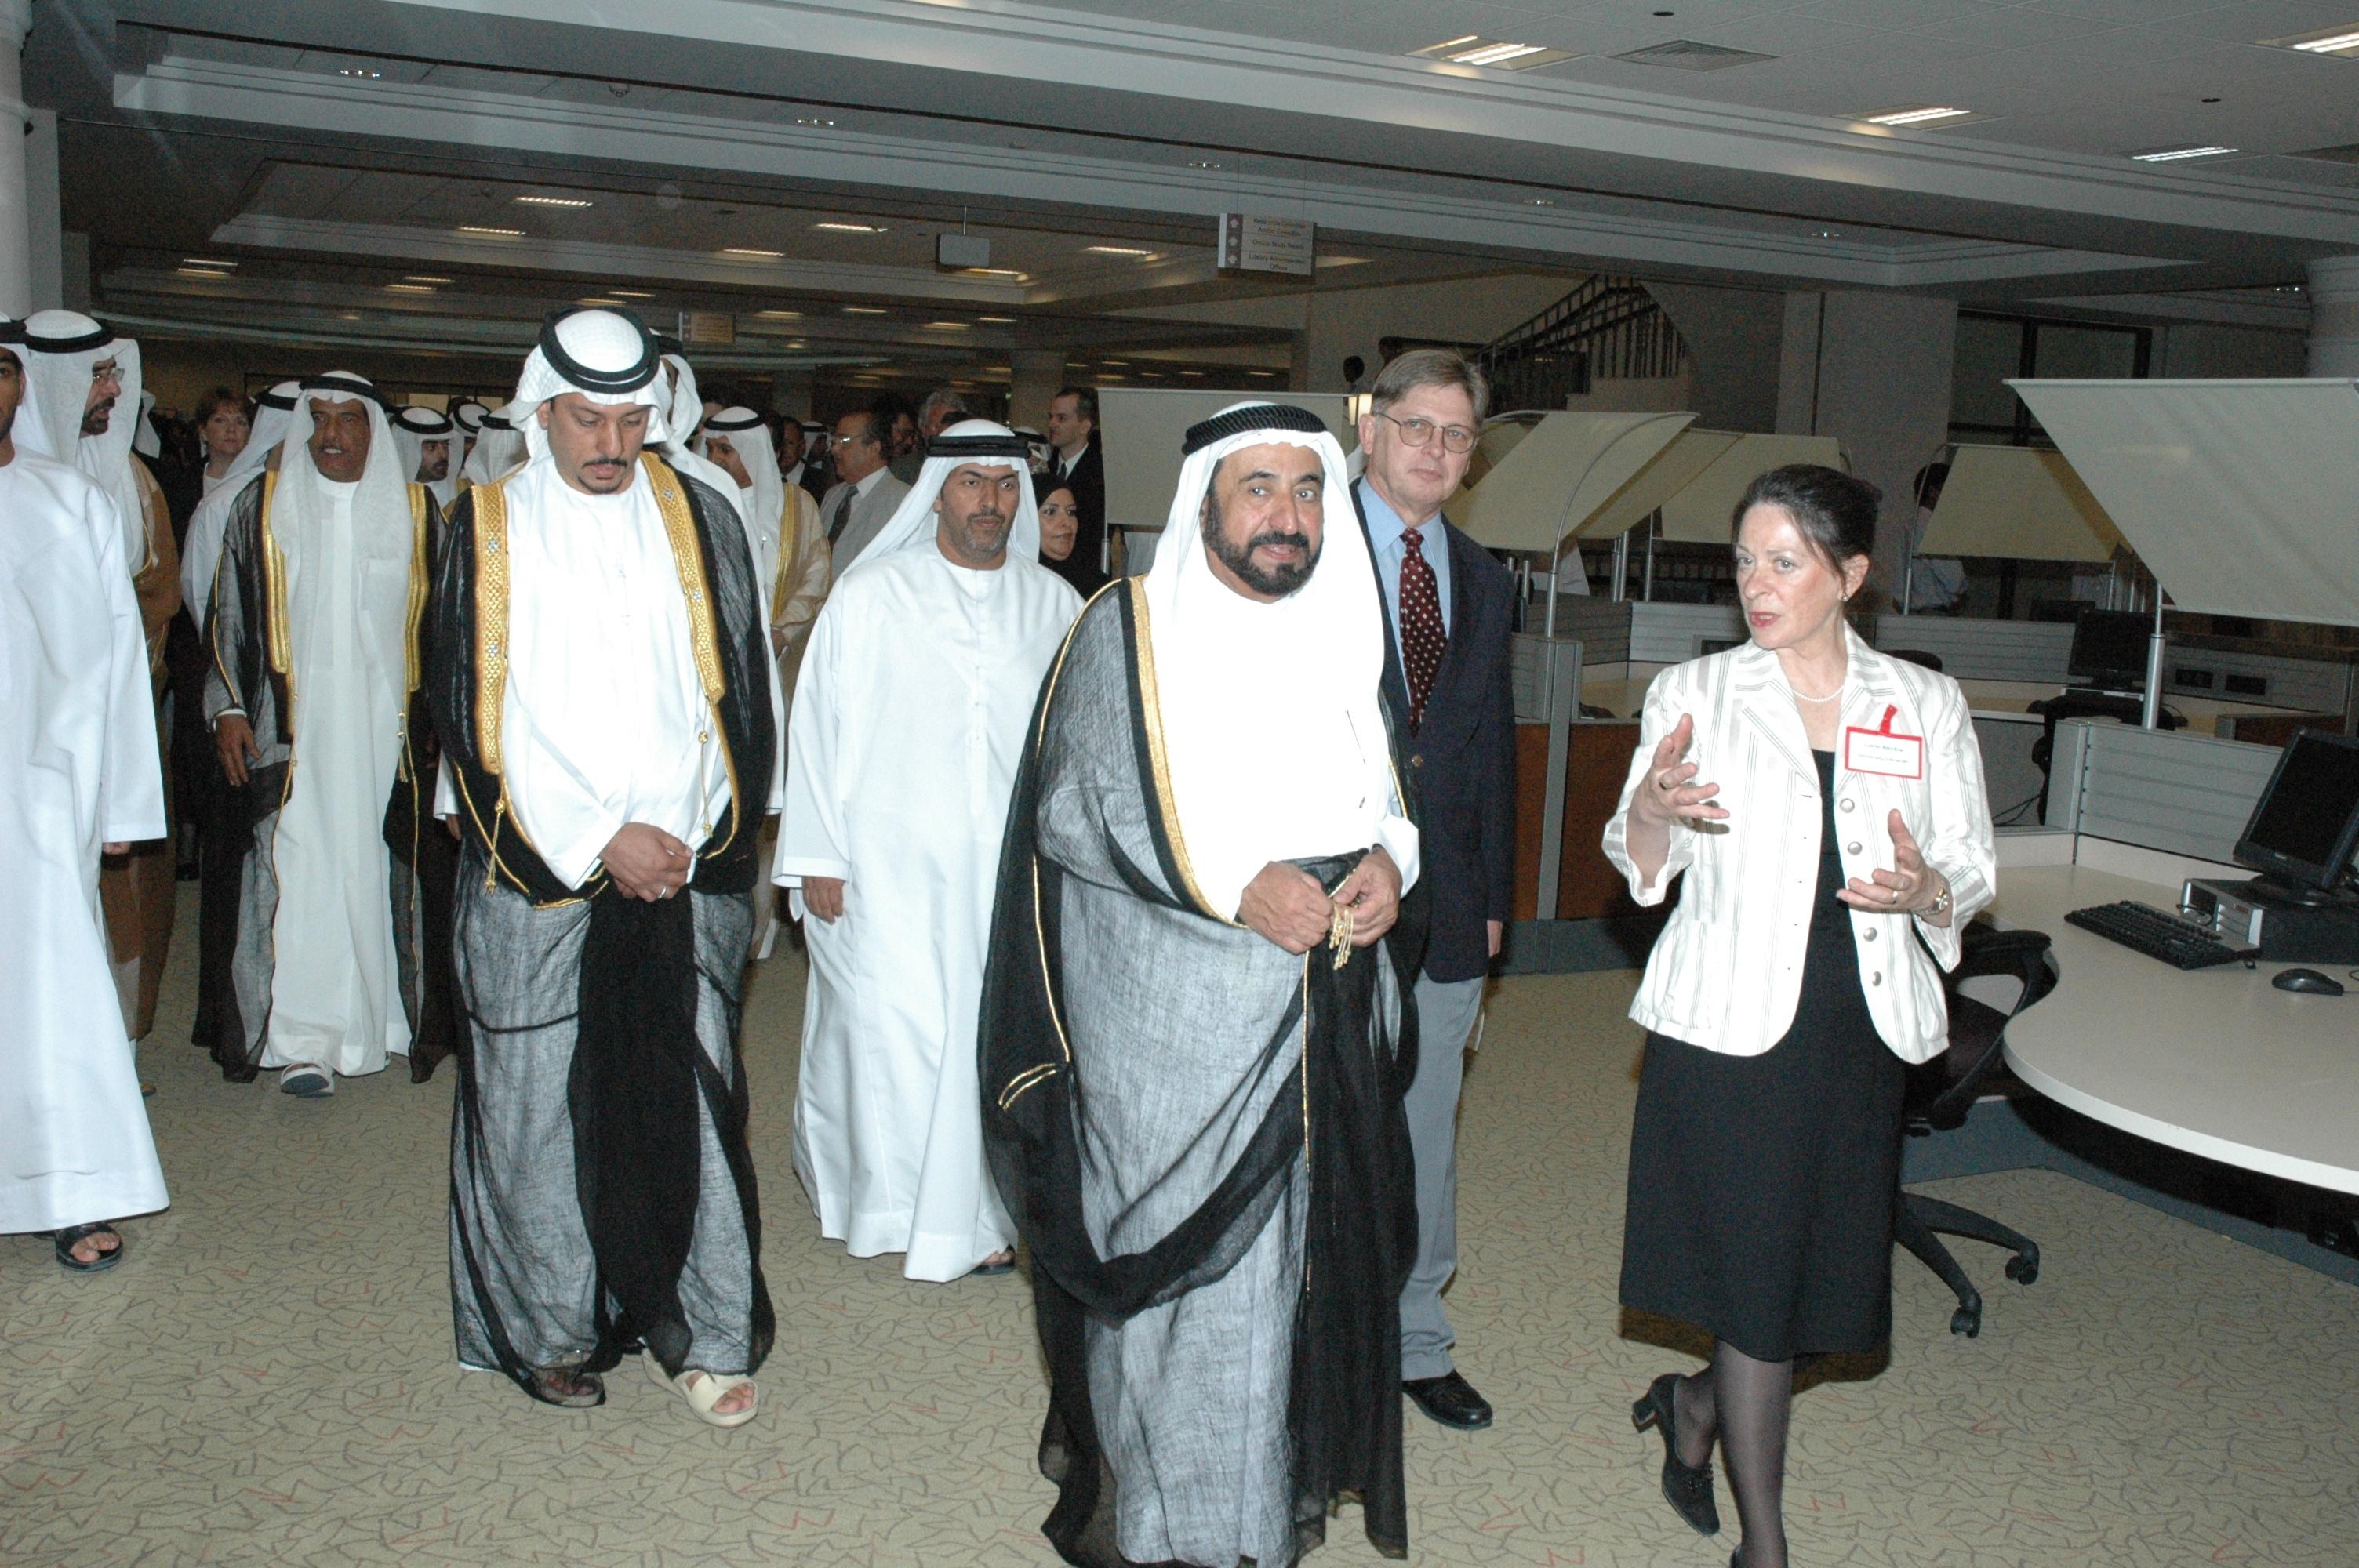 American_University_of_Sharjah_Library_14.jpg